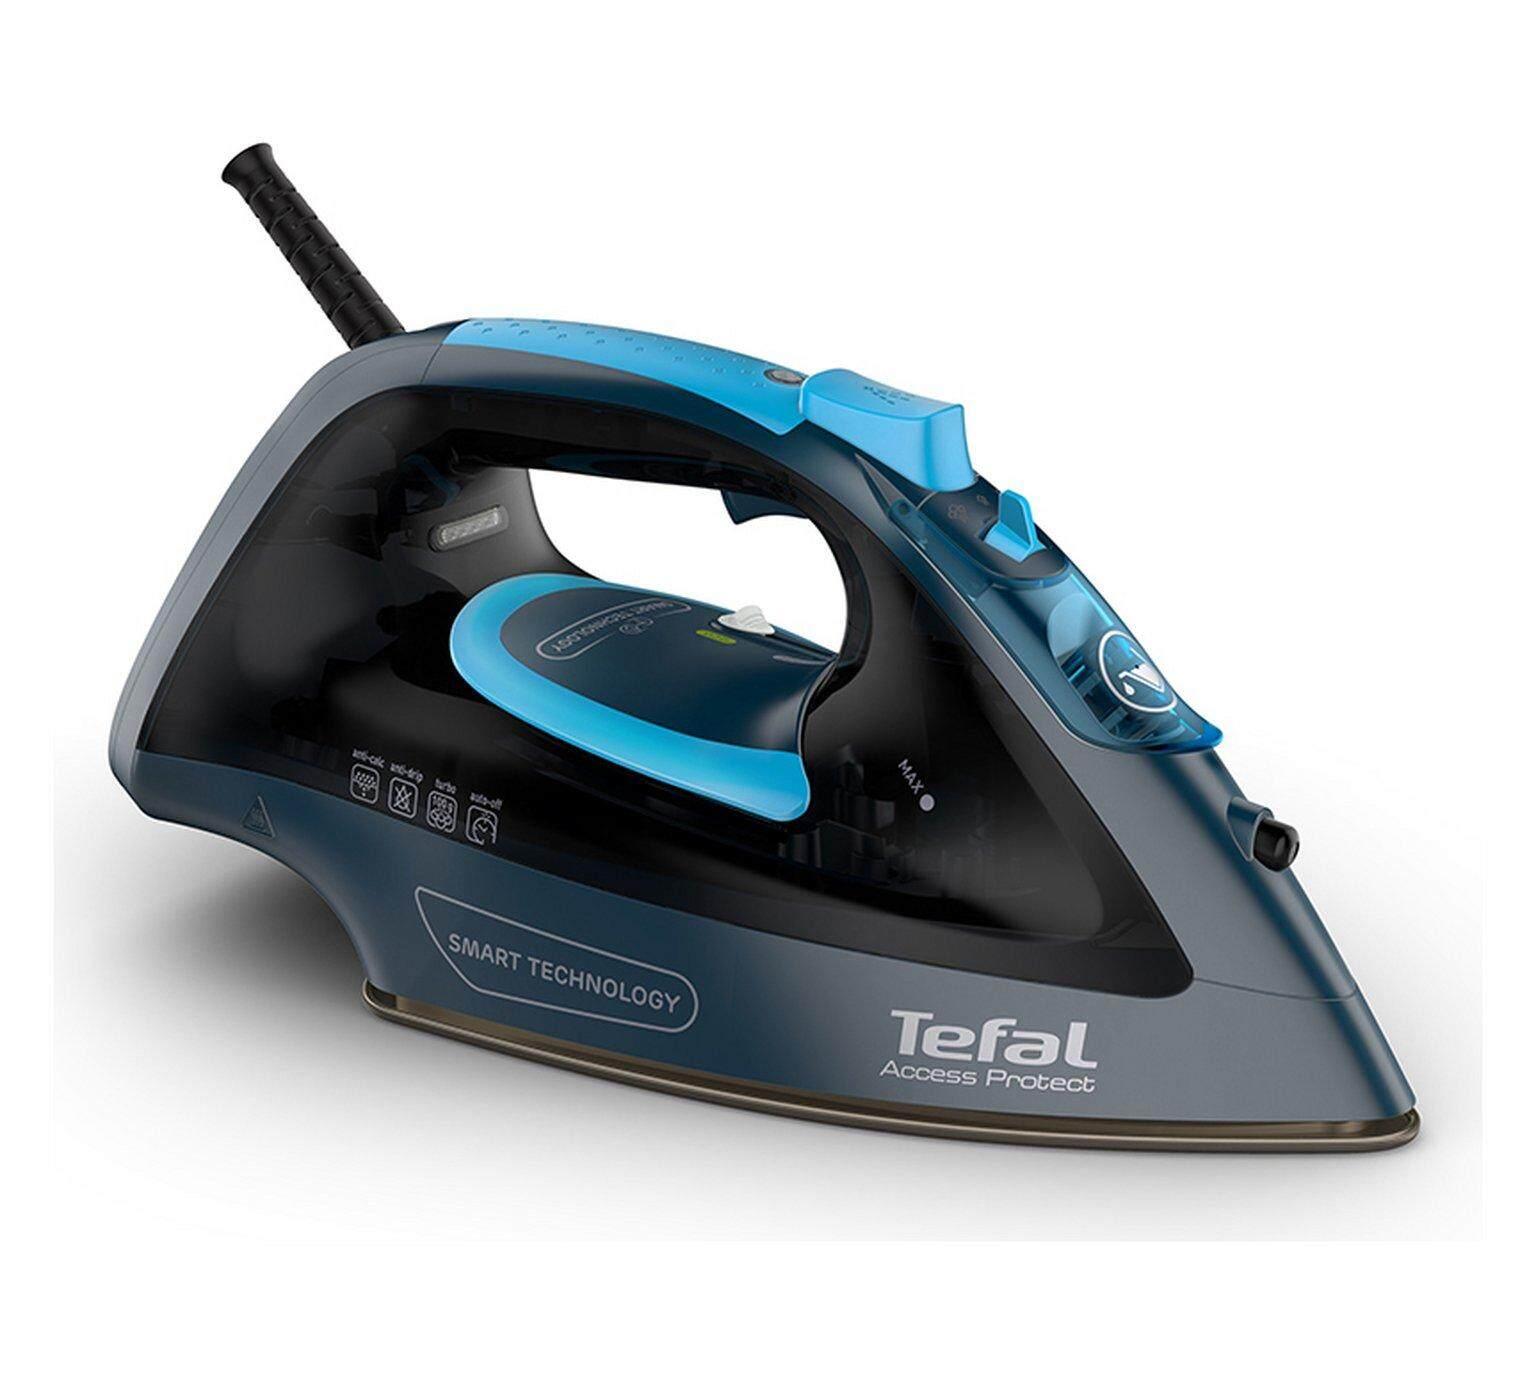 TEFAL รีดผ้าไม่ไหม้ ไม่ต้องปรับอุณหภูมิ เตารีดไอน้ำ รุ่น FV1611 สีดำ  THAIMART